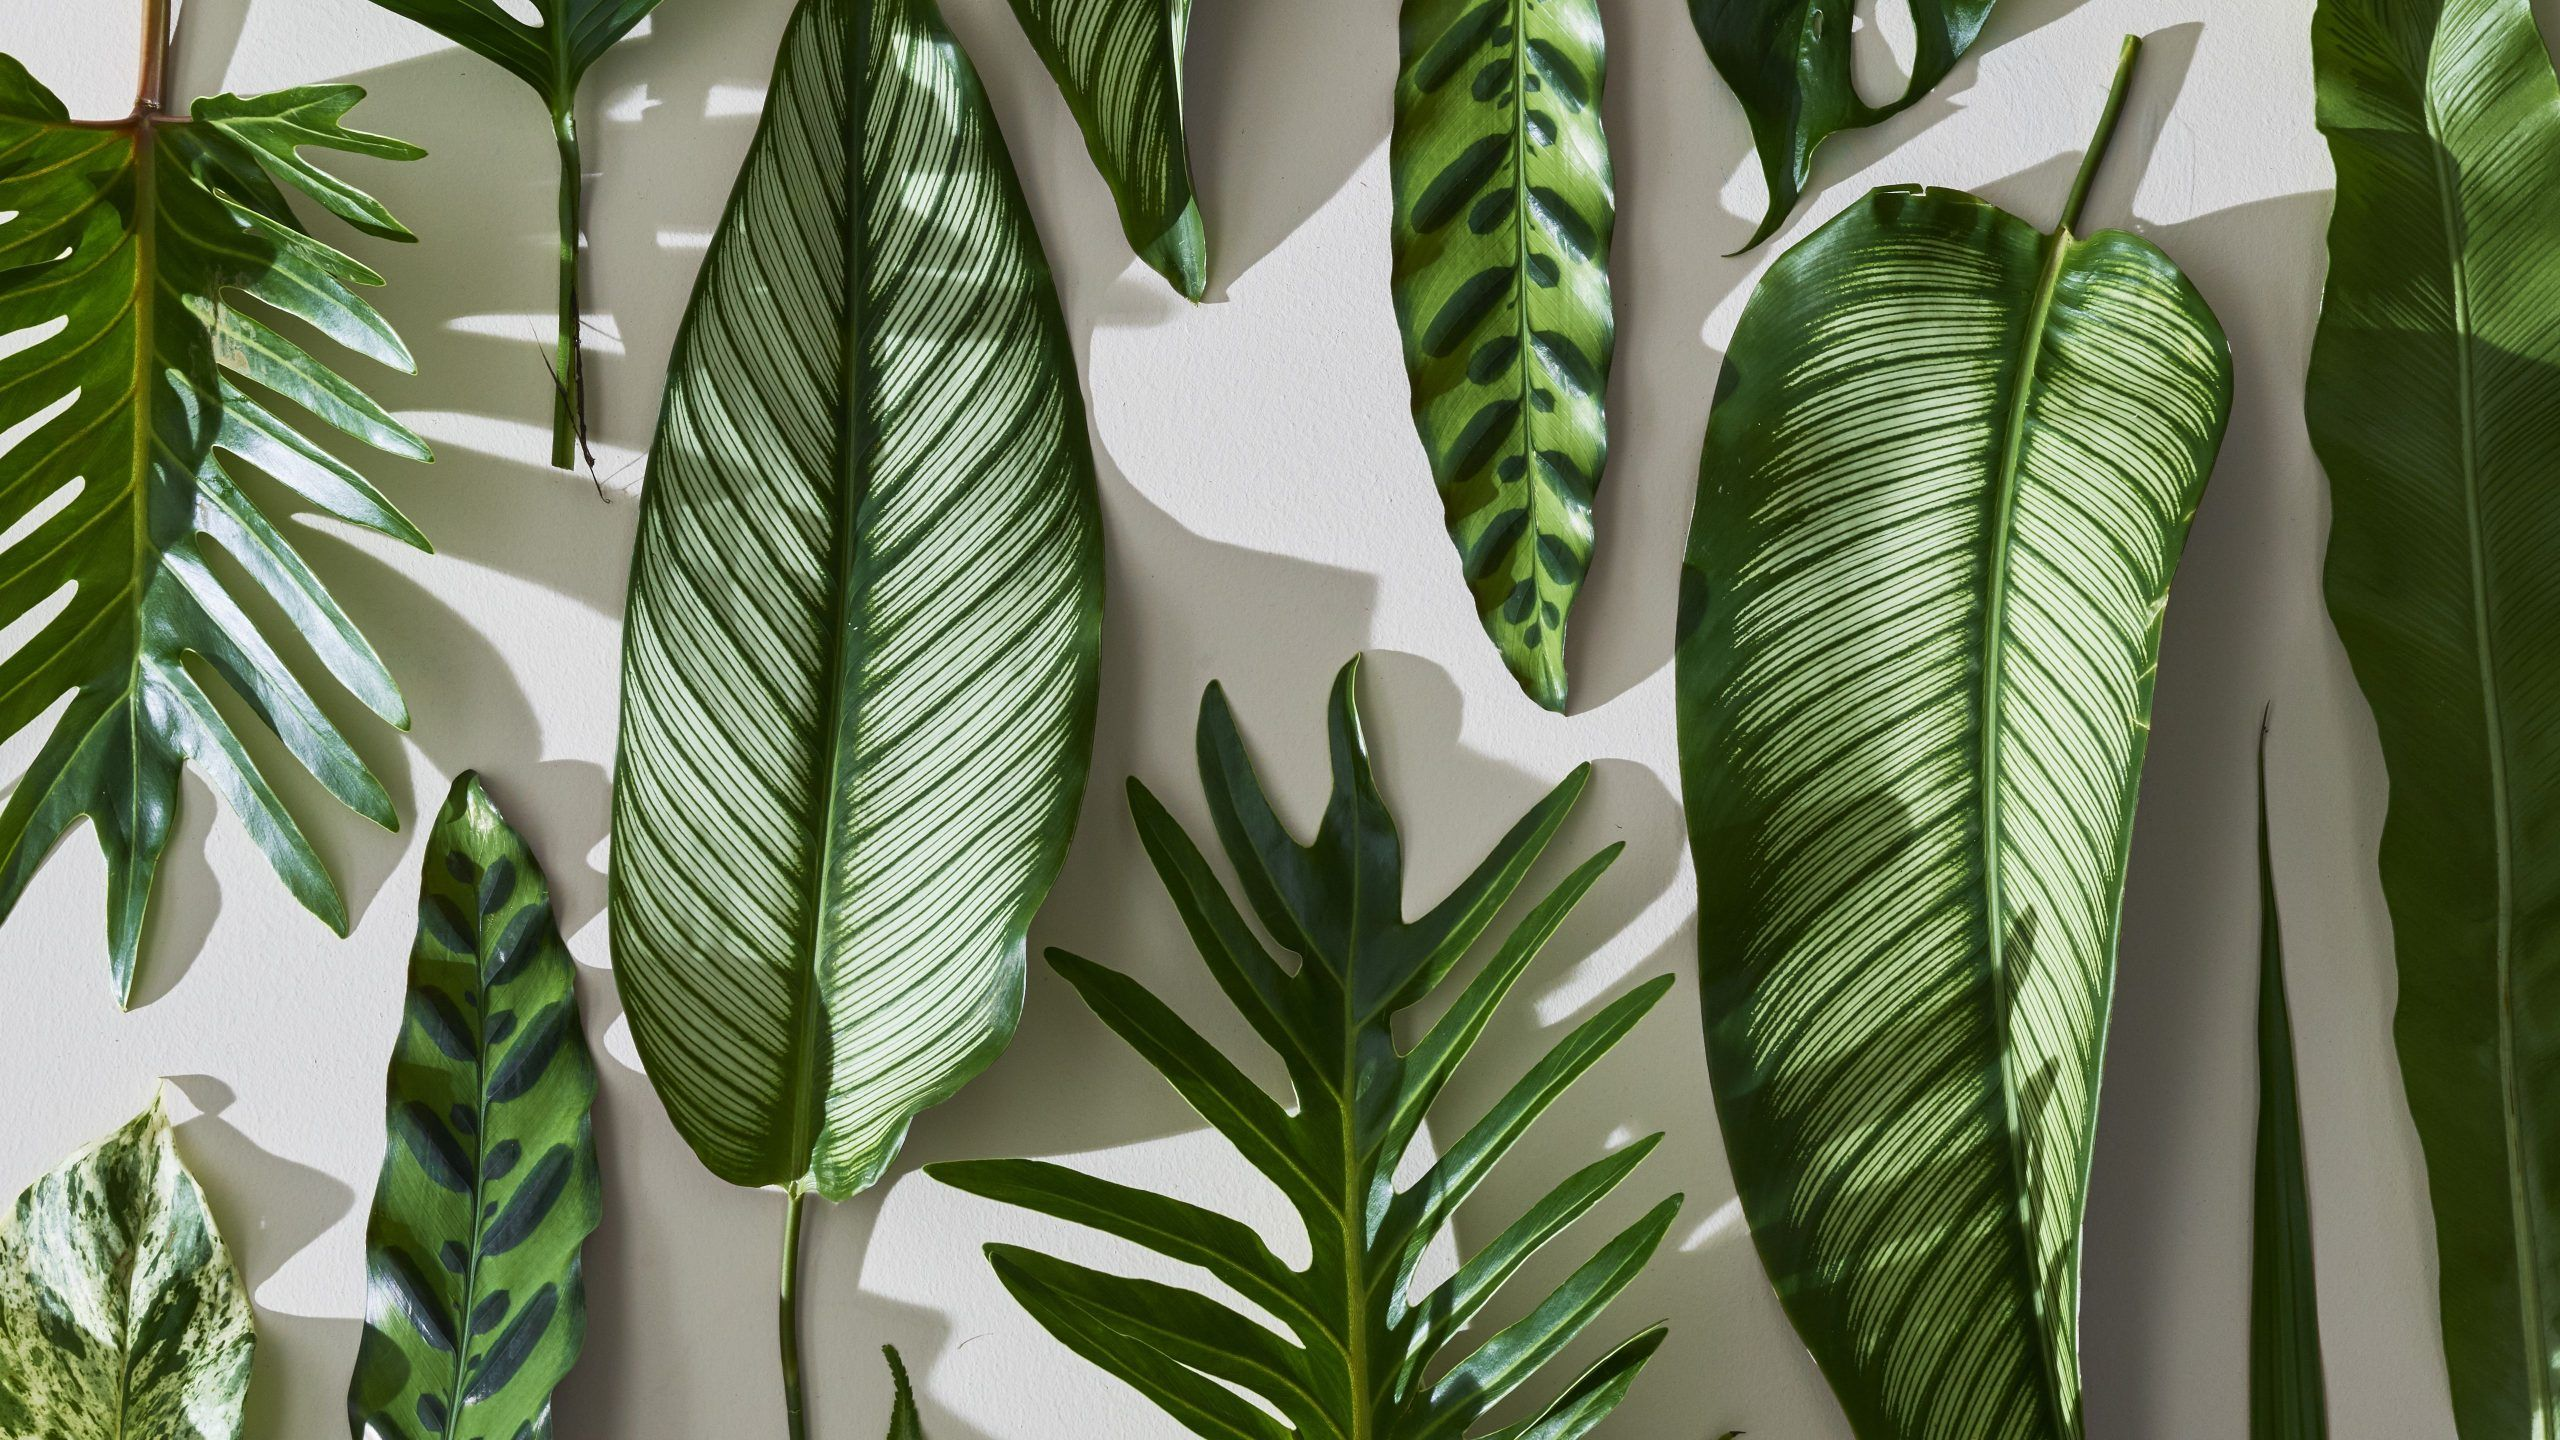 60 tropical leaves desktop wallpapers download at